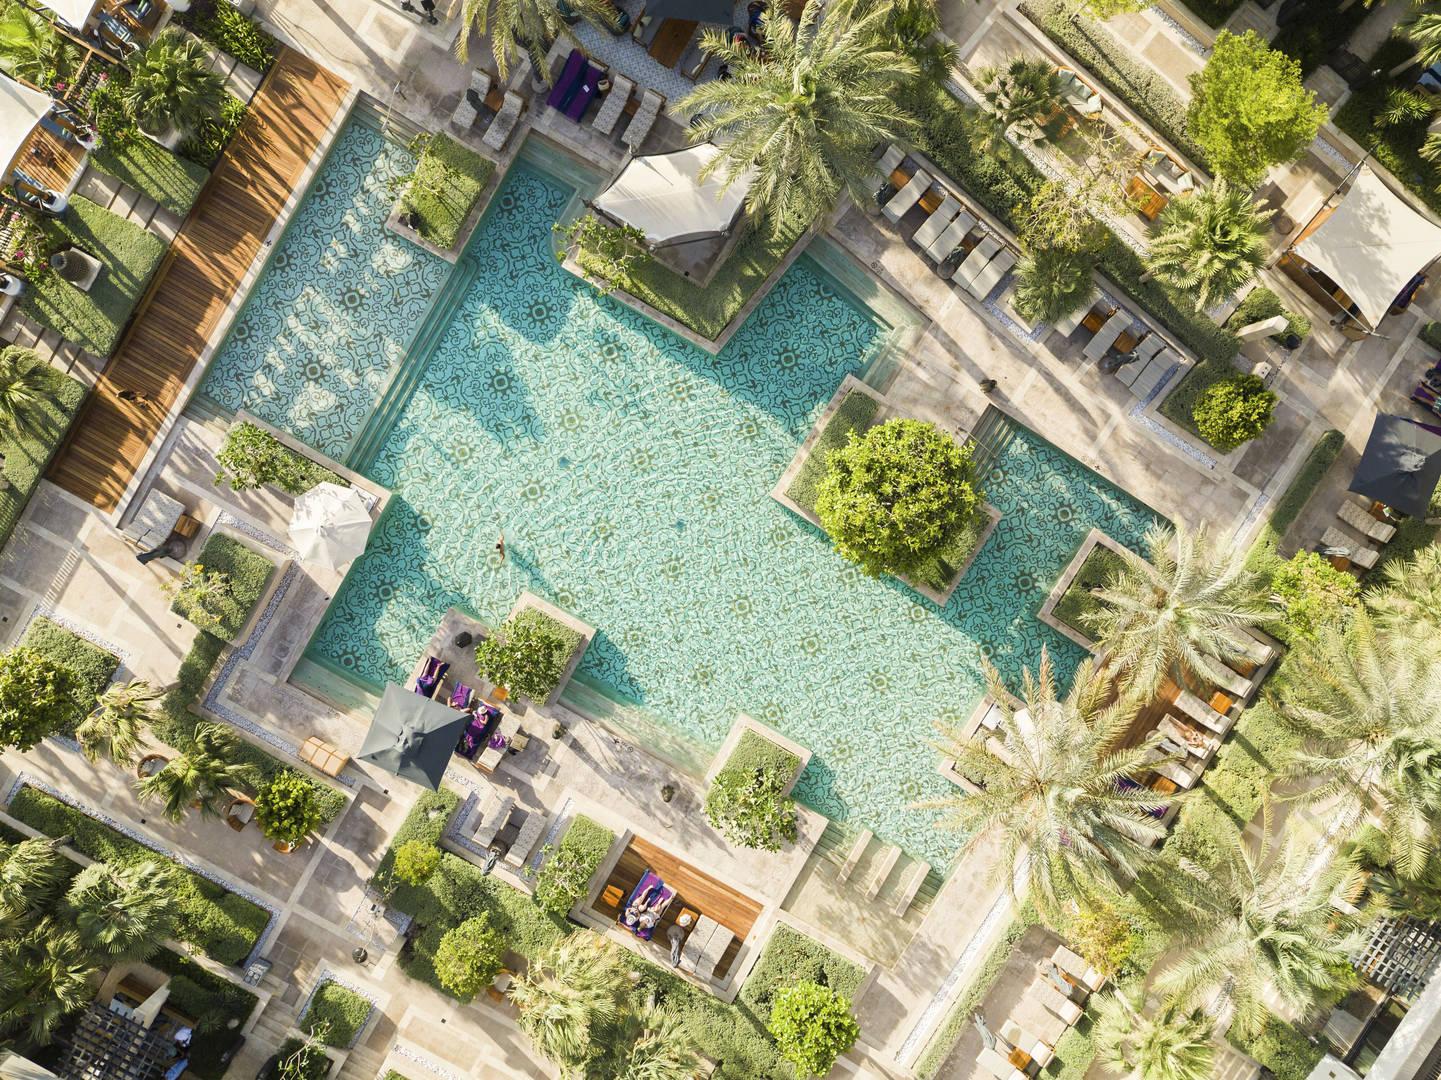 Aerial view of Jumeirah Al Naseem's pools